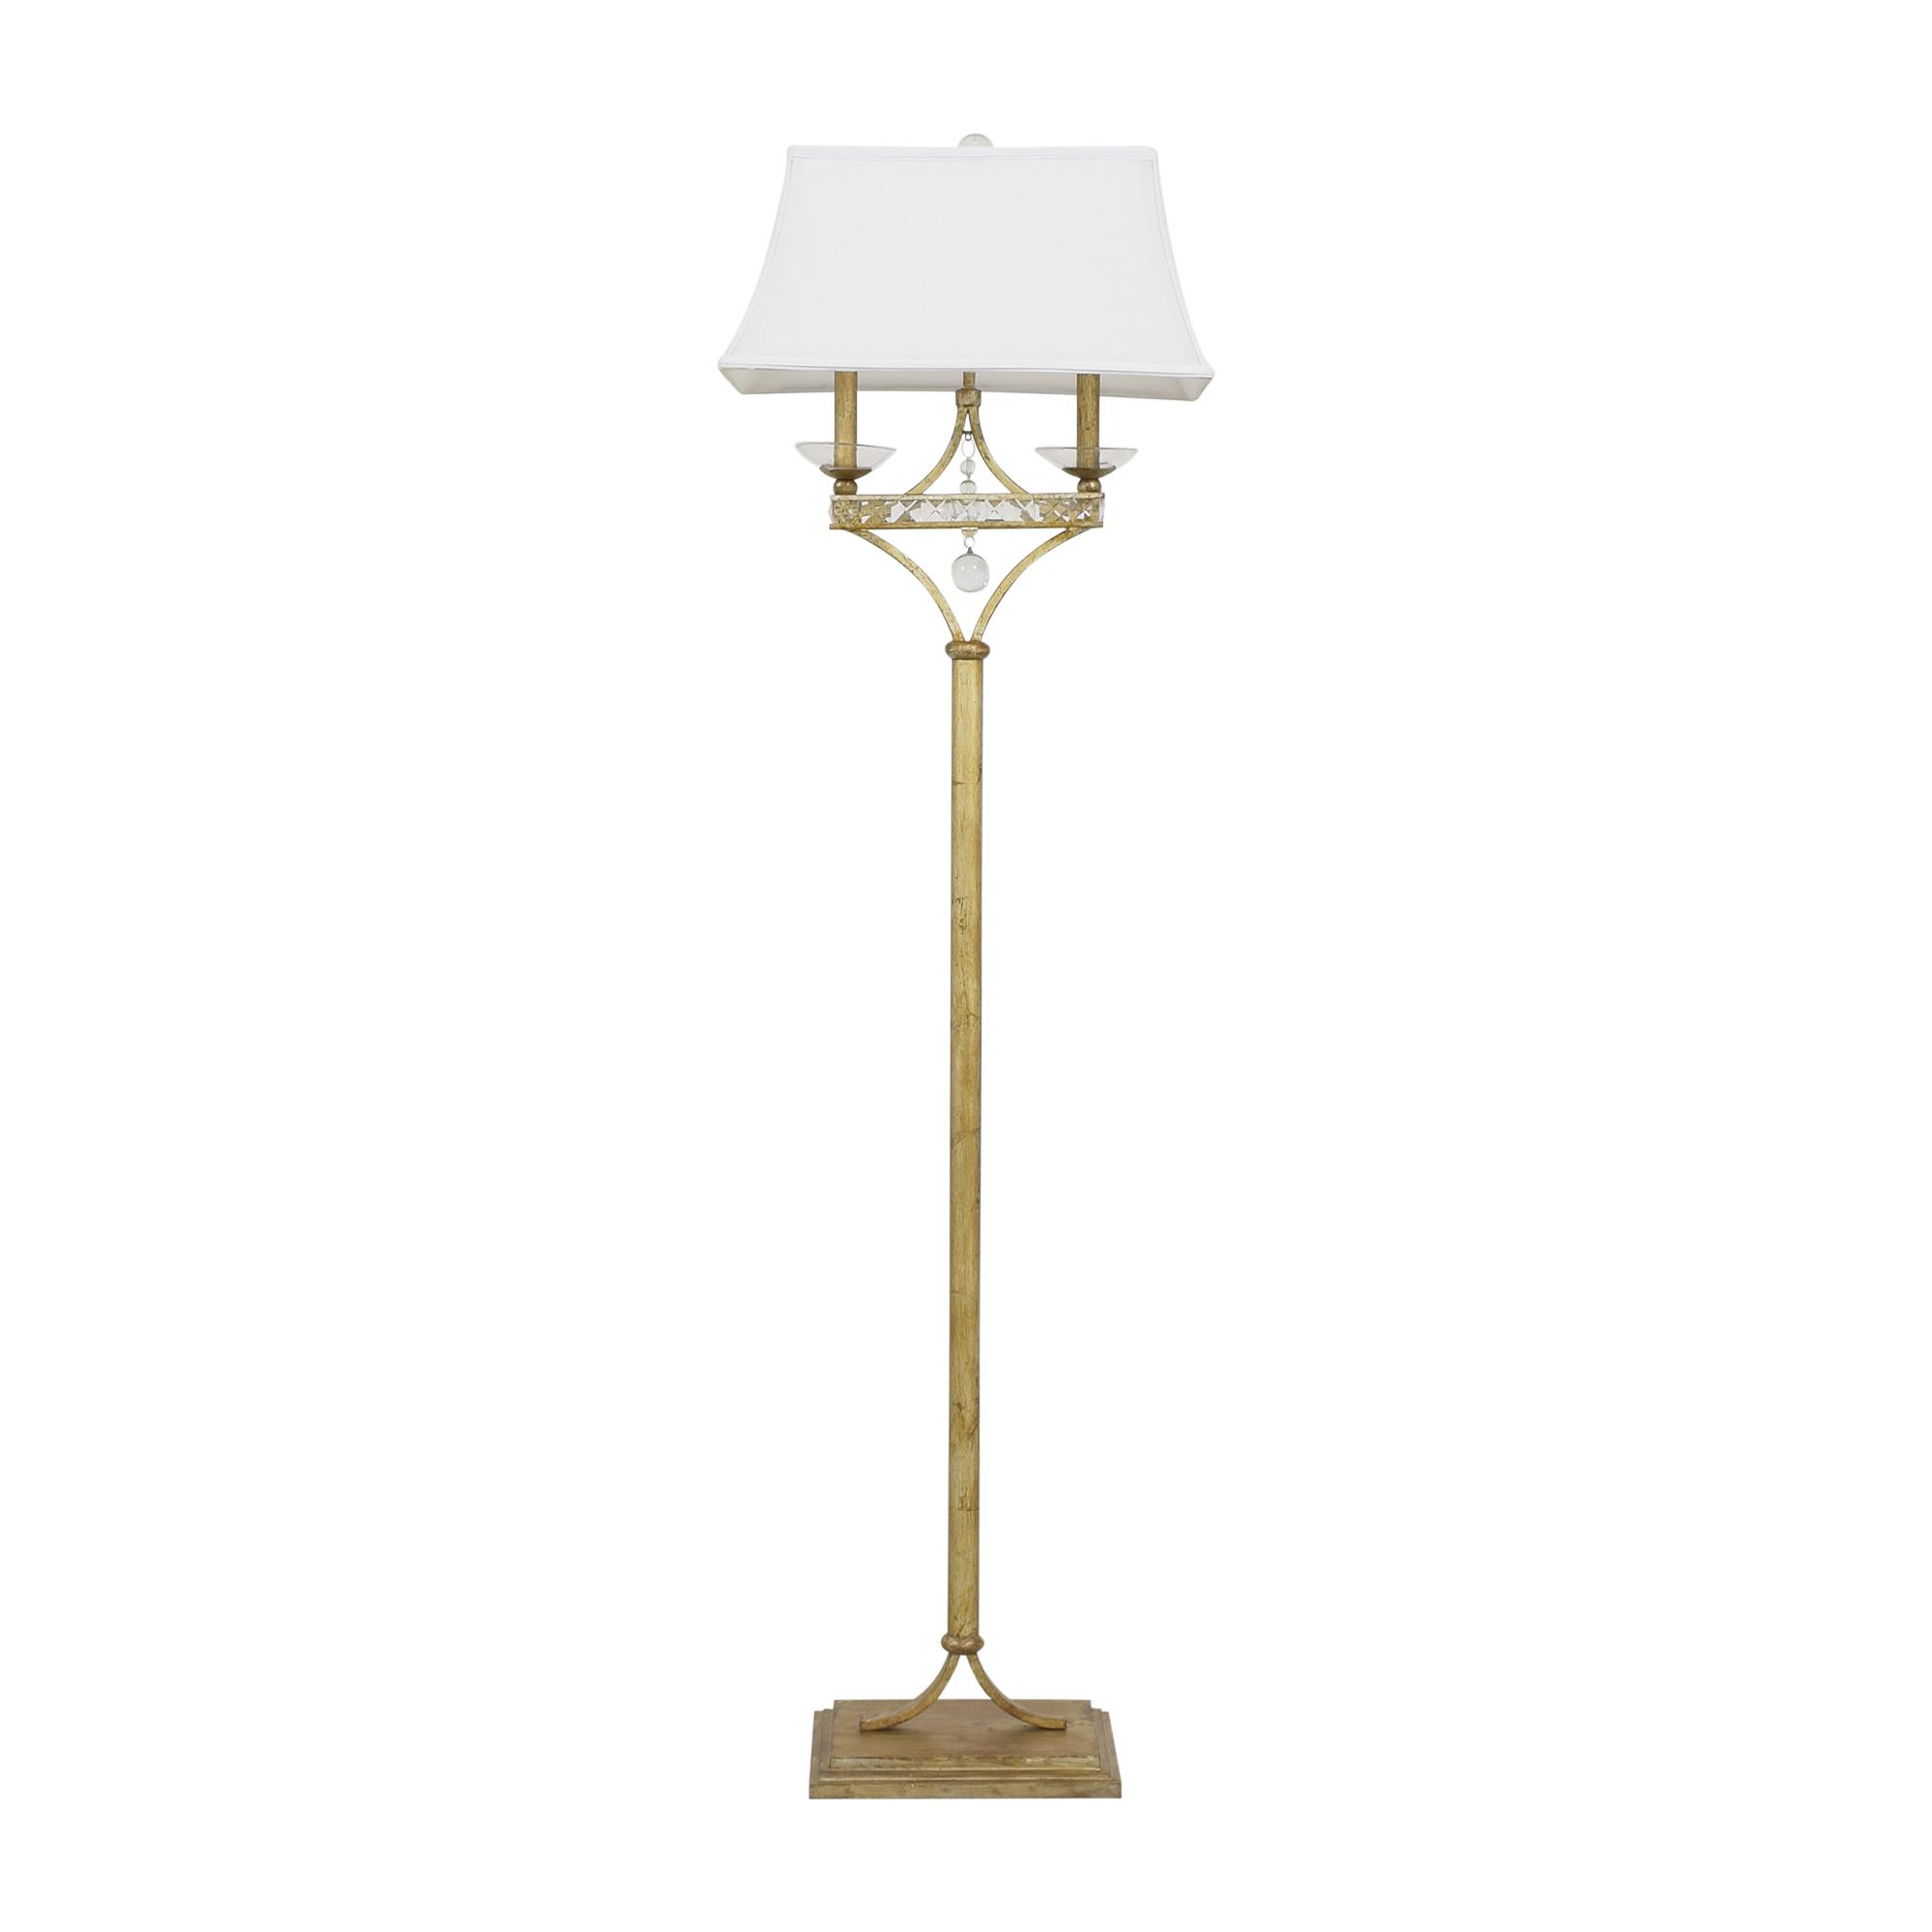 Lamps Plus Lamps Plus Candice Olson Aristocrat Floor Lamp Lamps